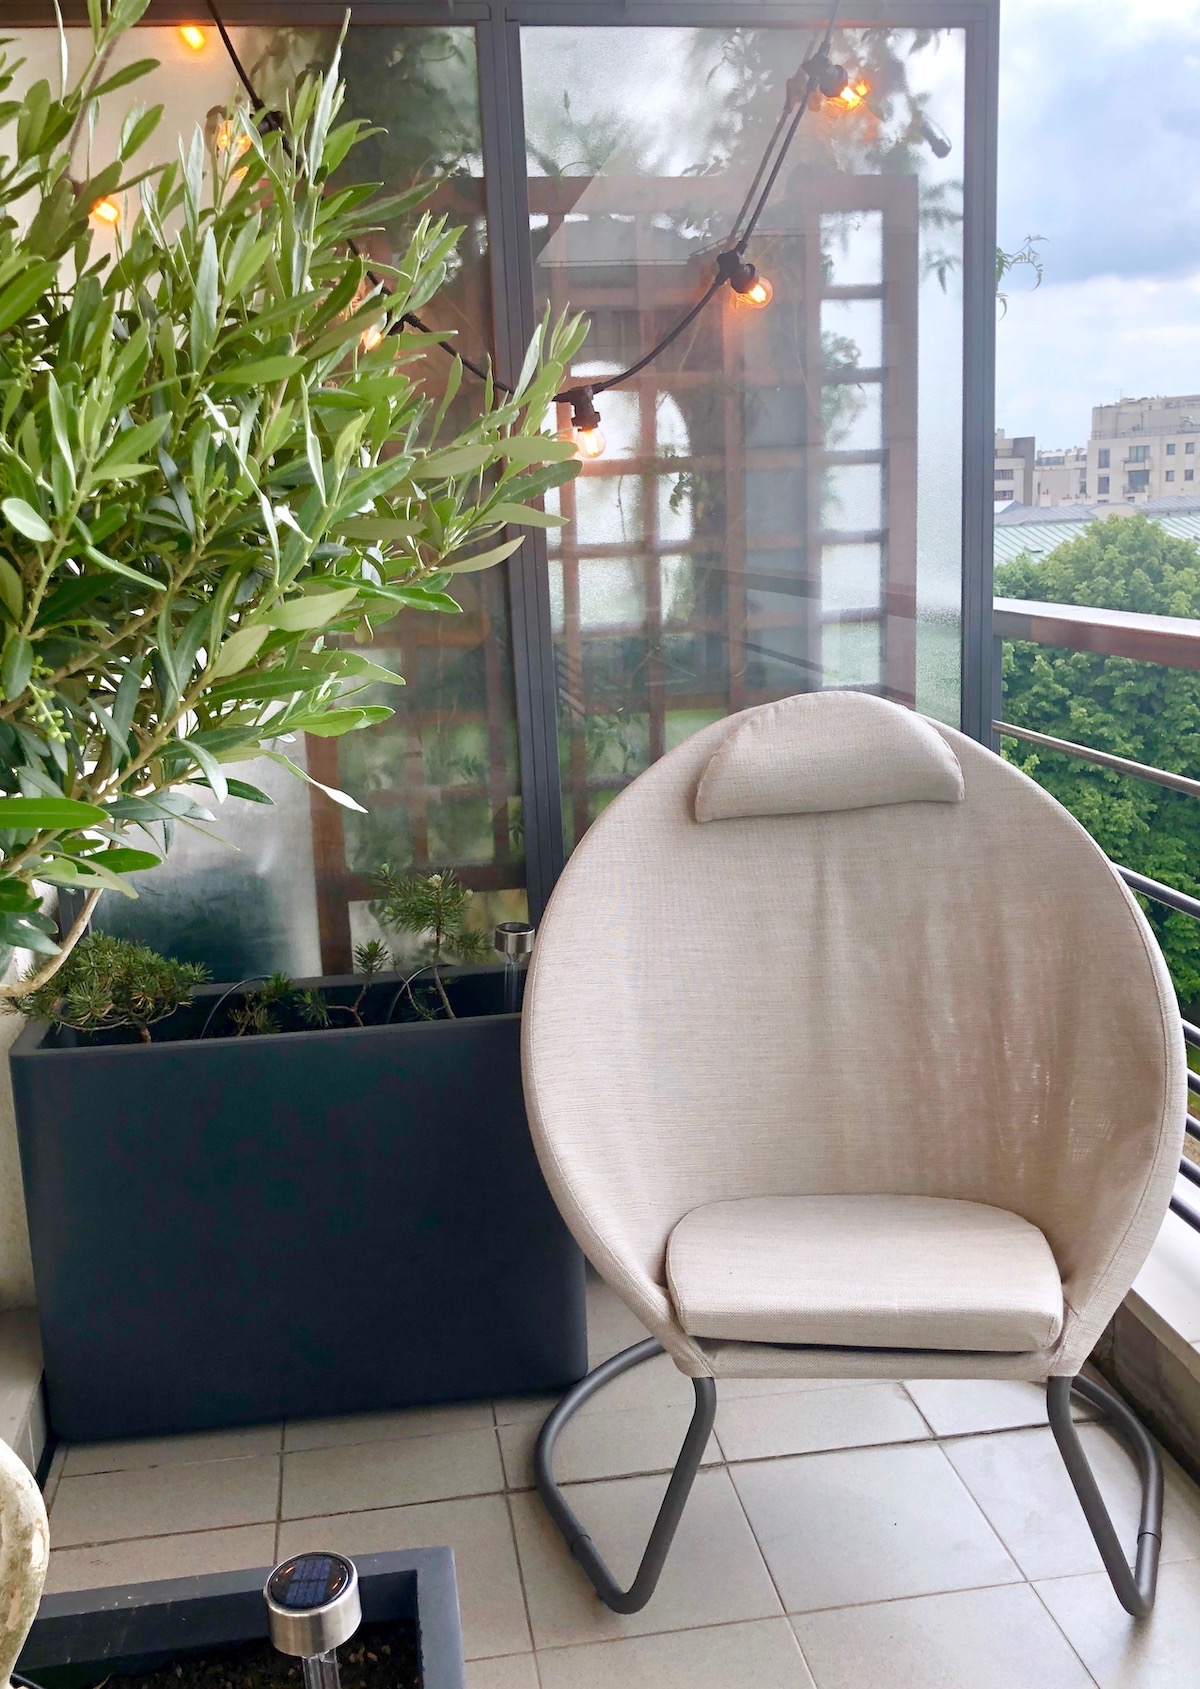 terrasse paris fauteuil lafuma lounge avis guirlande guinguette ampoule filament vintage